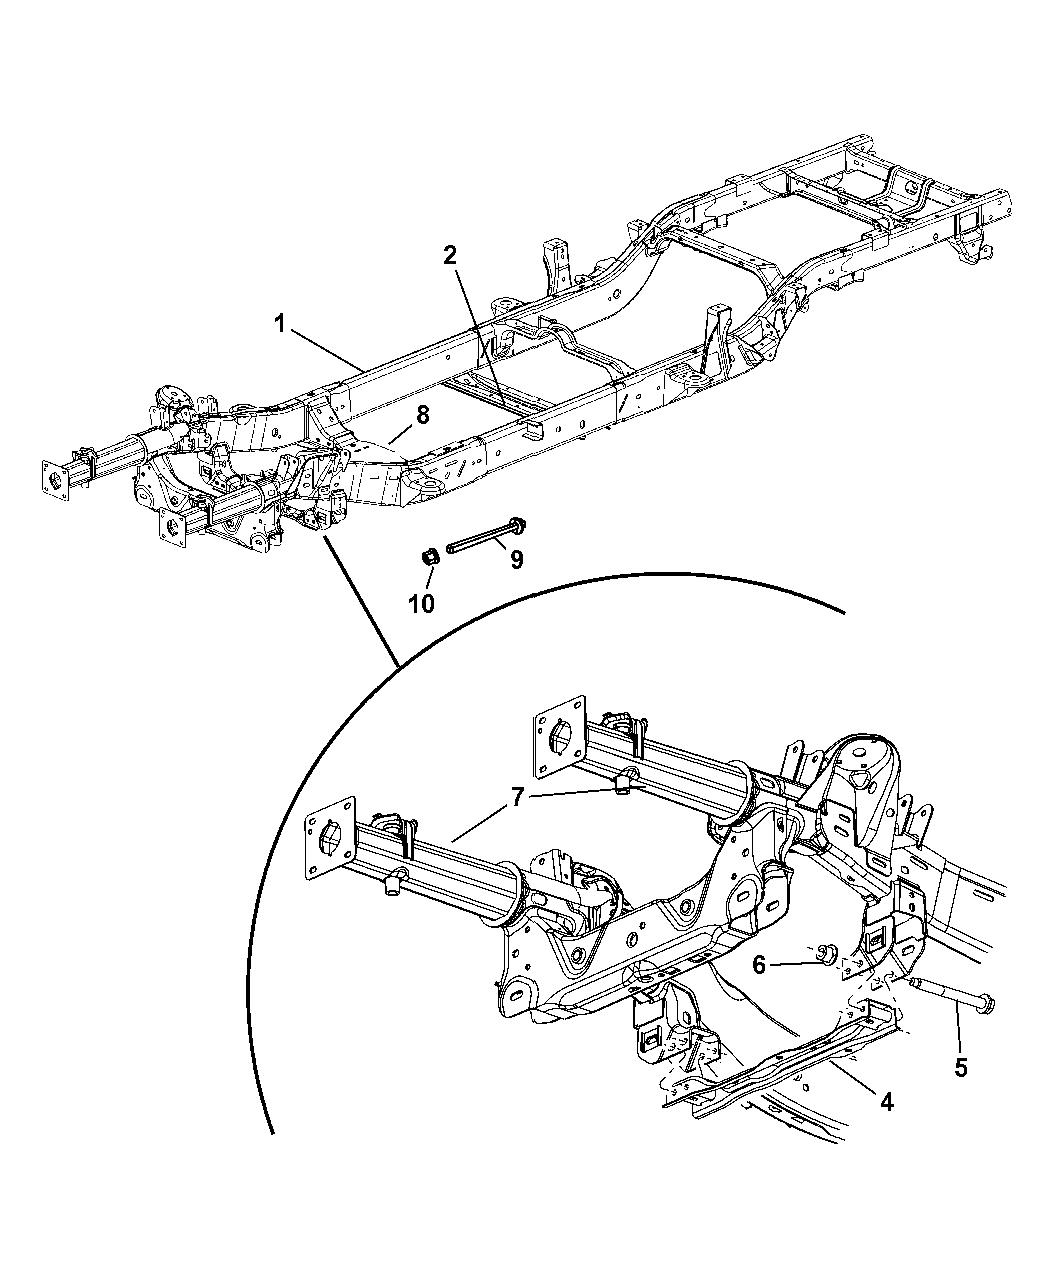 Vehicle parts & accessories 2005 dodge dakota factory repair.